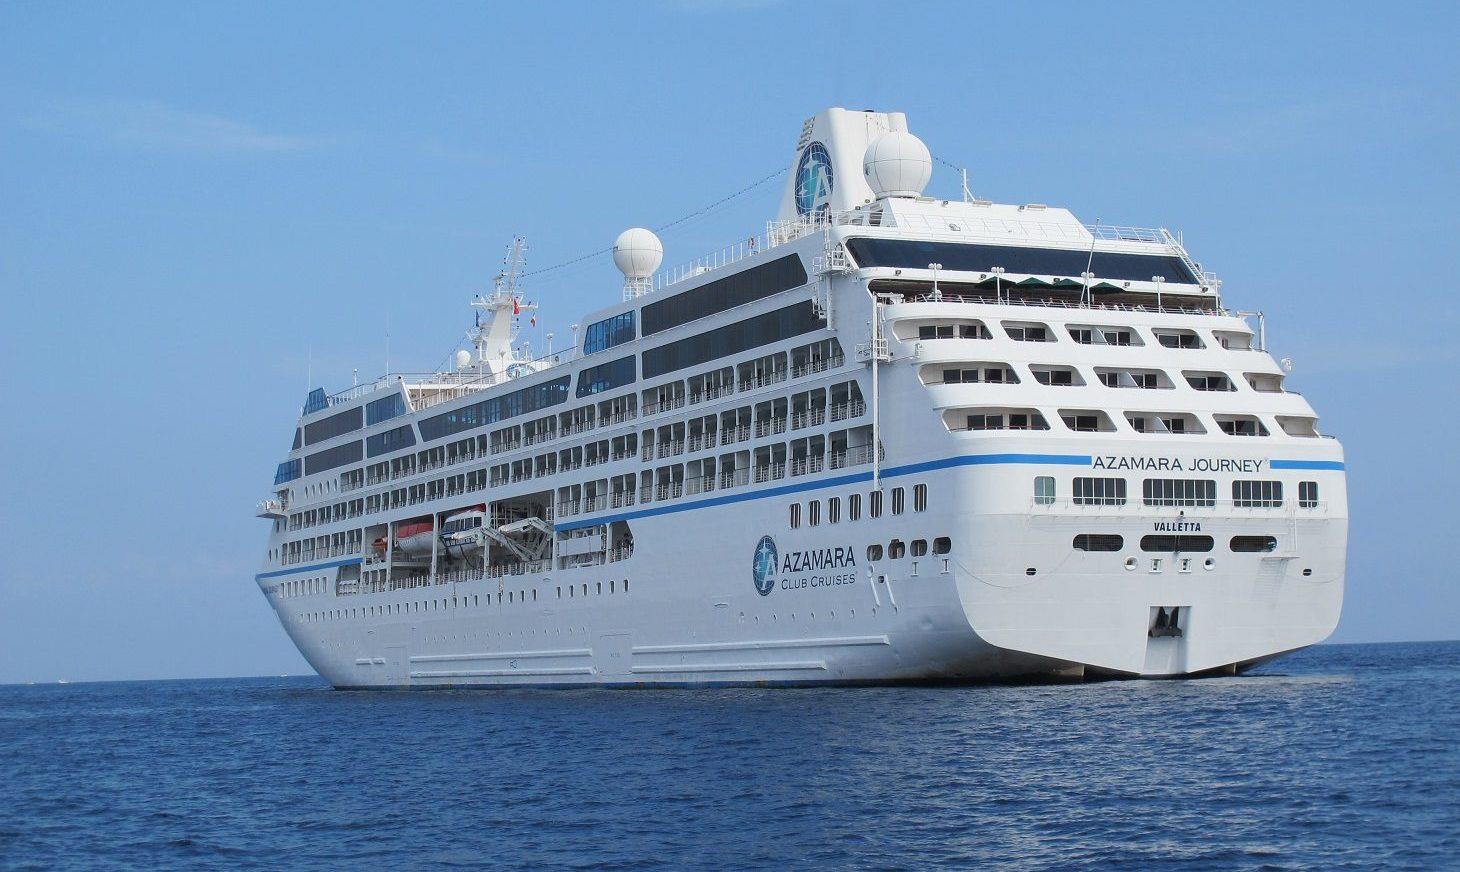 Azamara Journey kryssningsfartyg